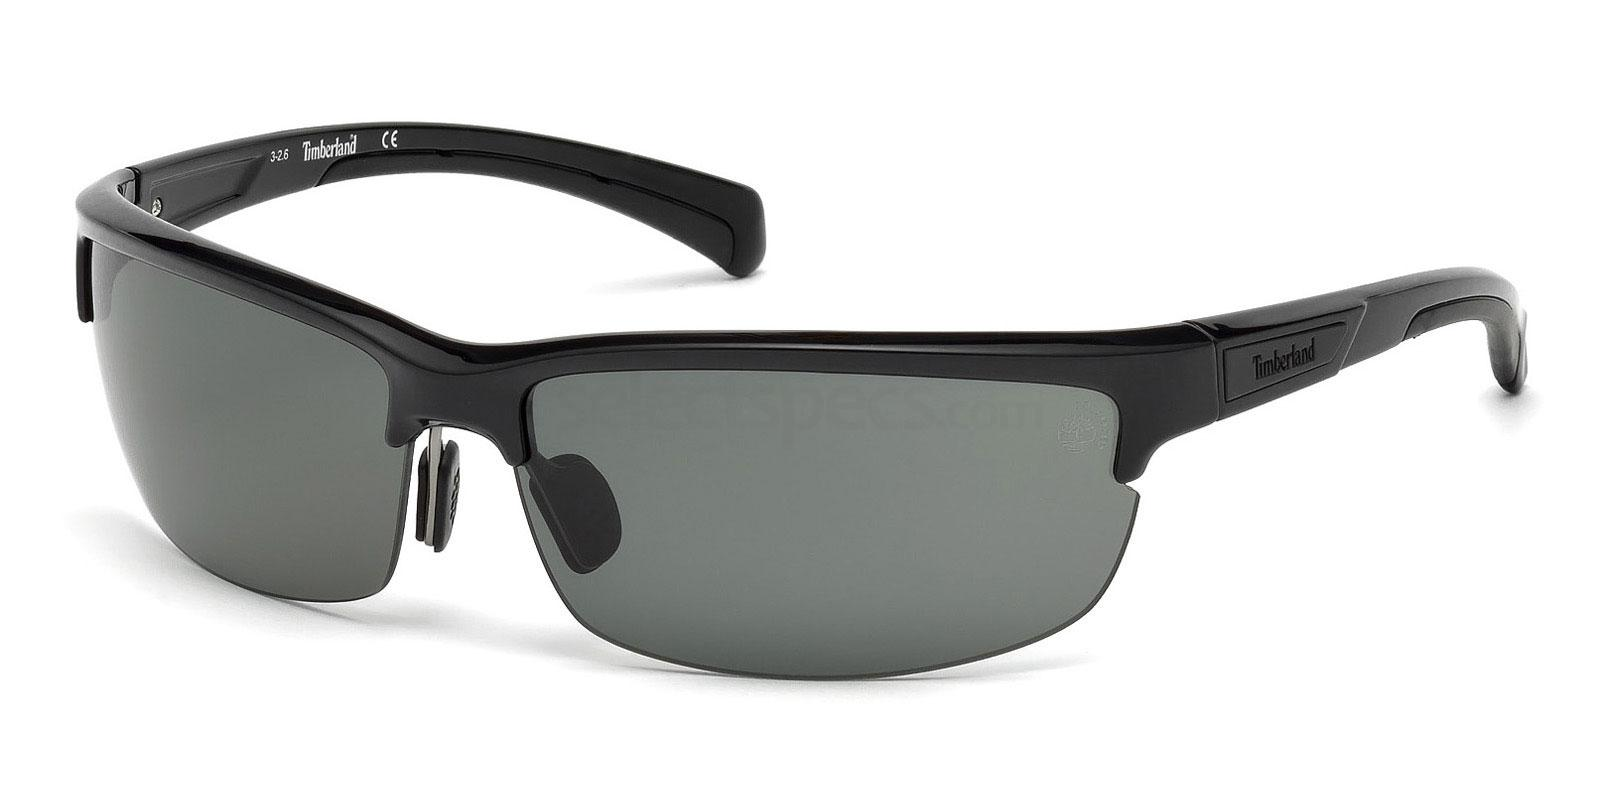 01D TB9103 Sunglasses, Timberland